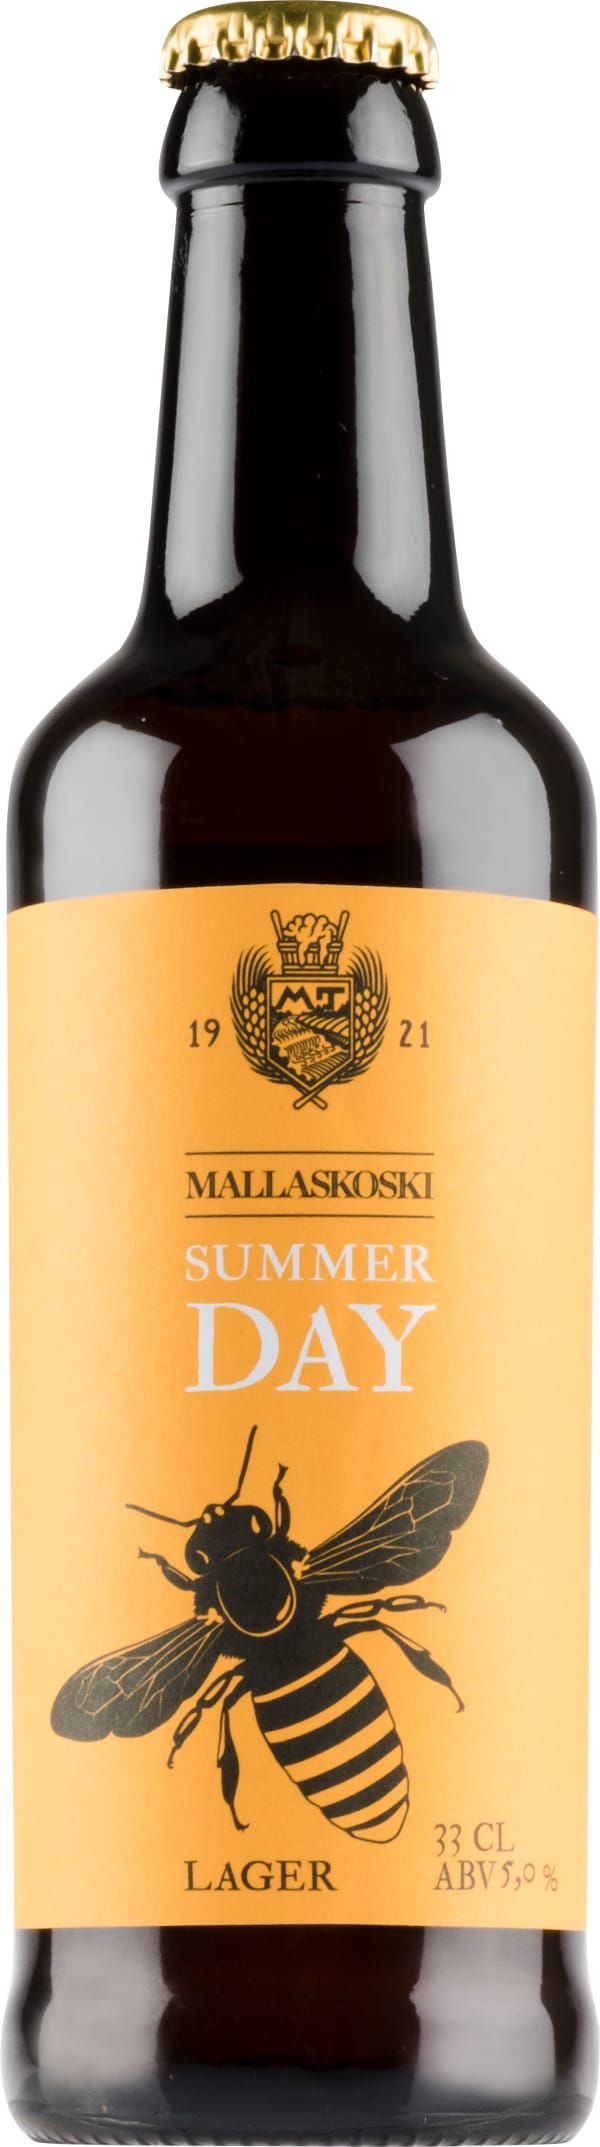 Mallaskoski Summer Day Lager